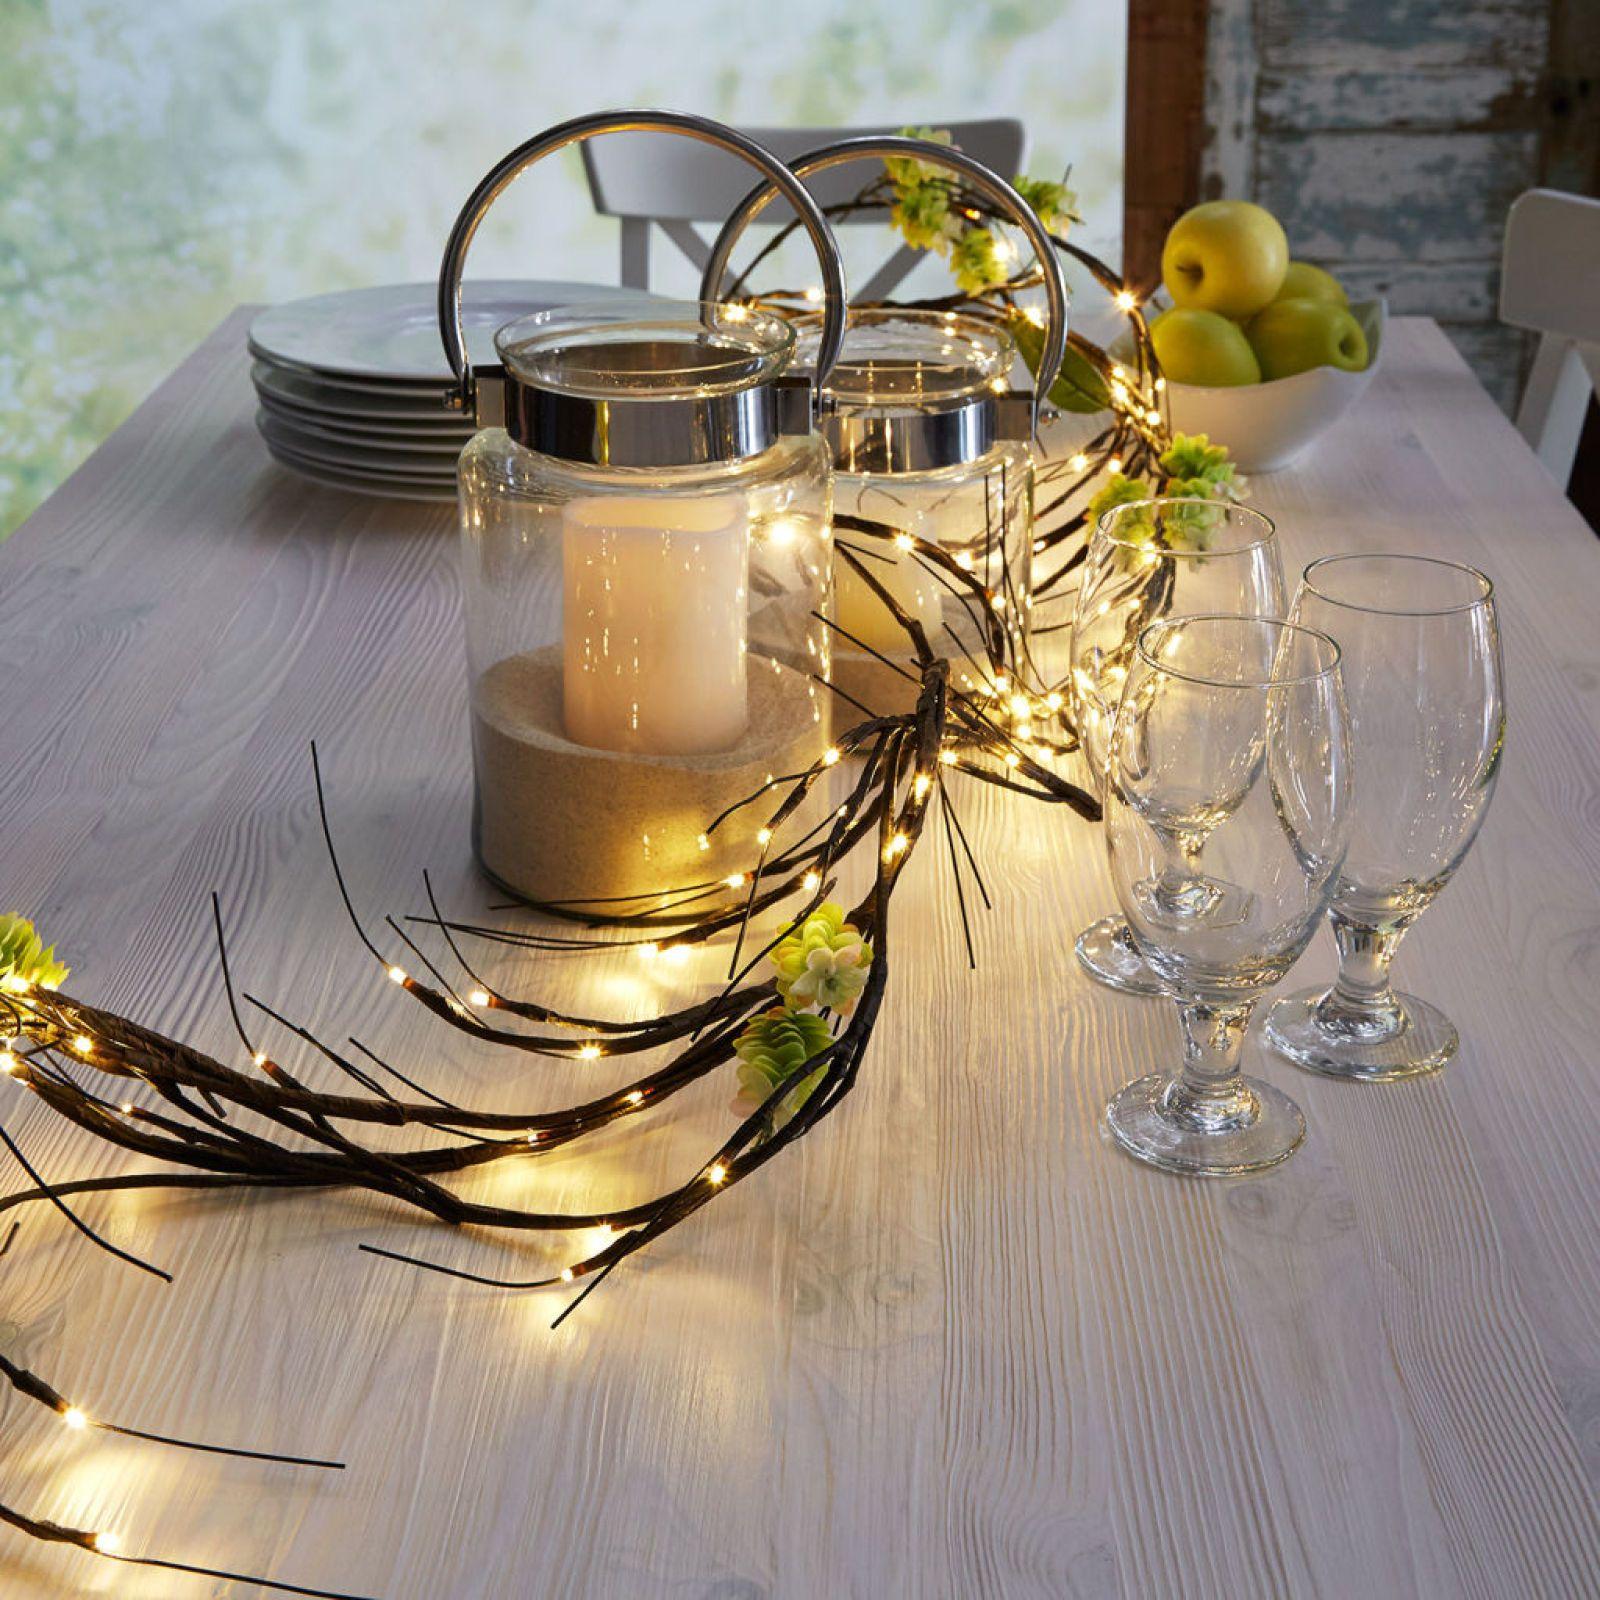 Diy halloween wedding decorations  Lighted Branch Centerpiece  Crafty Things  Pinterest  Lighted